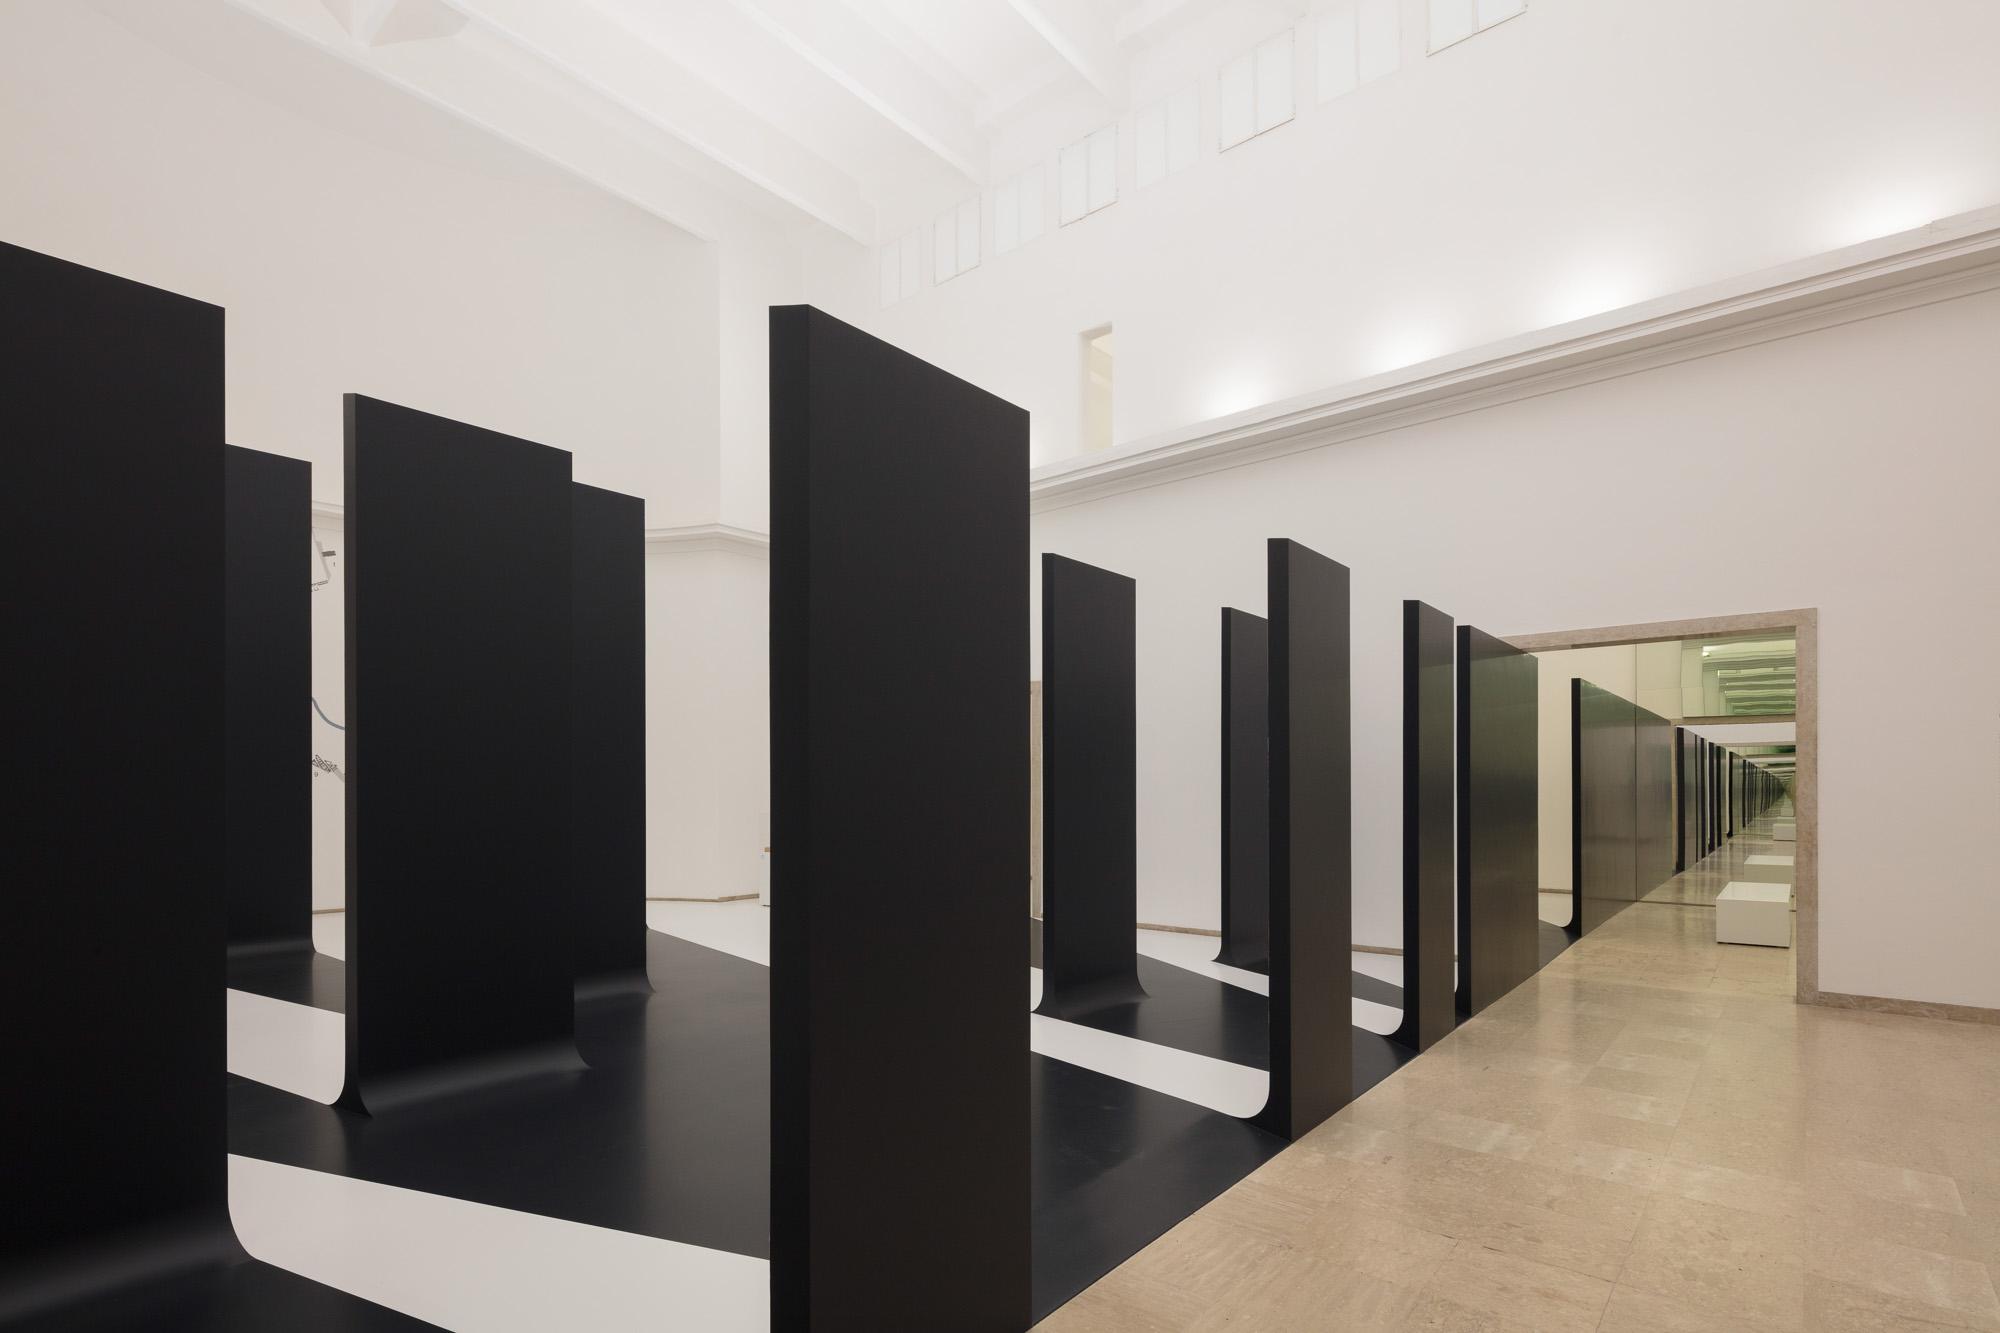 09-German Pavilion-Biennale Architettura 2018-c-Jan Bitter